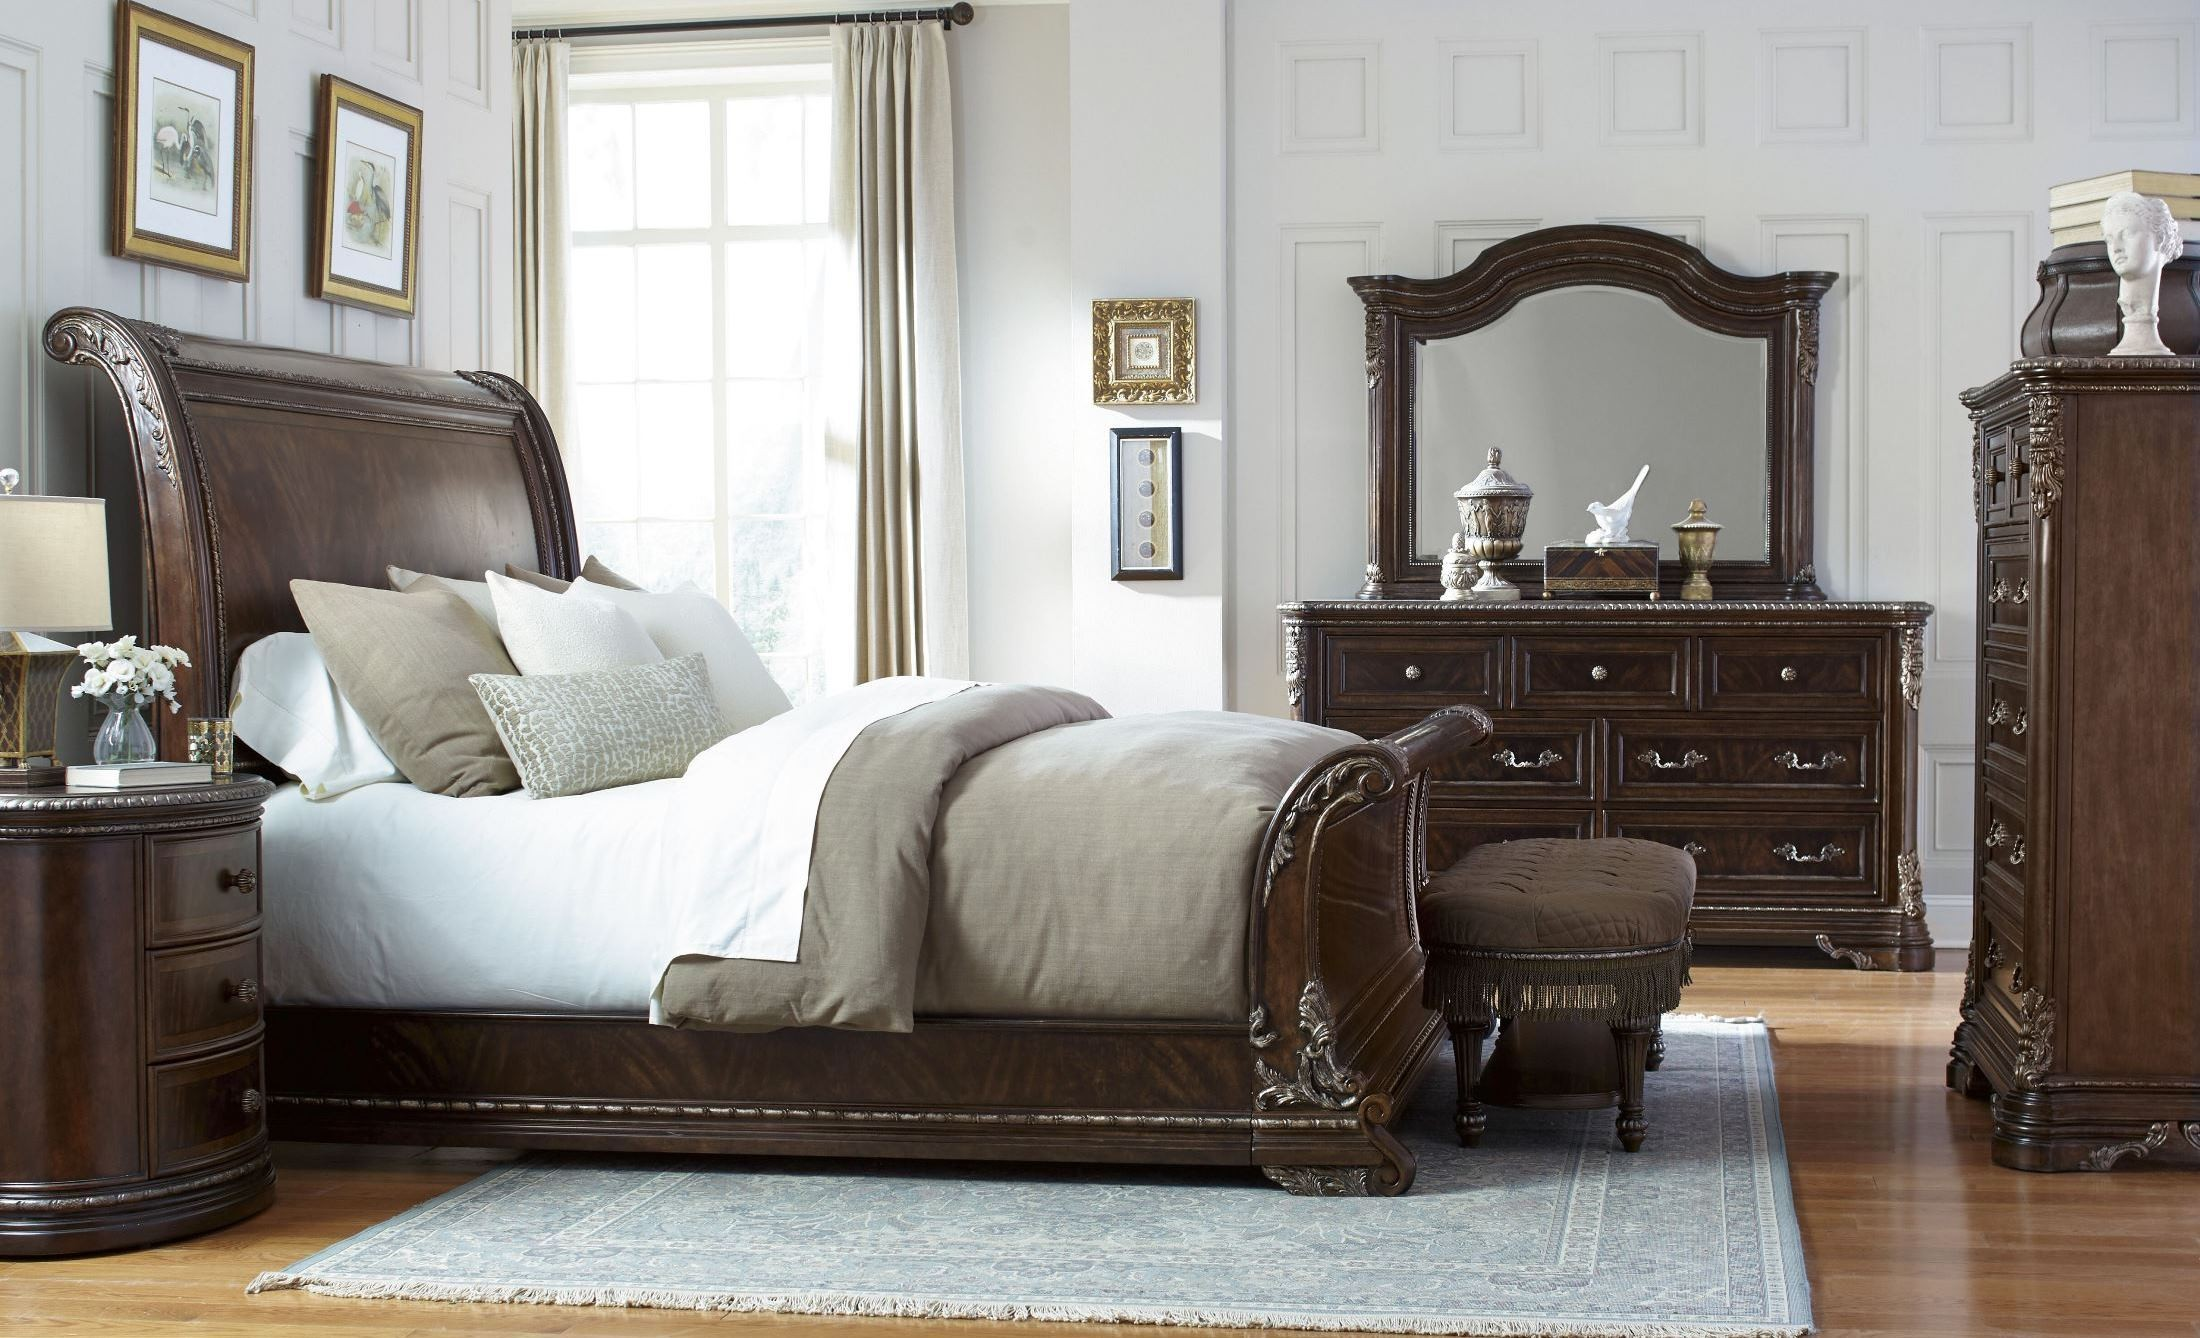 Sleigh Bedroom Set >> Gables Sleigh Bedroom Set from ART (245125-1707)   Coleman Furniture